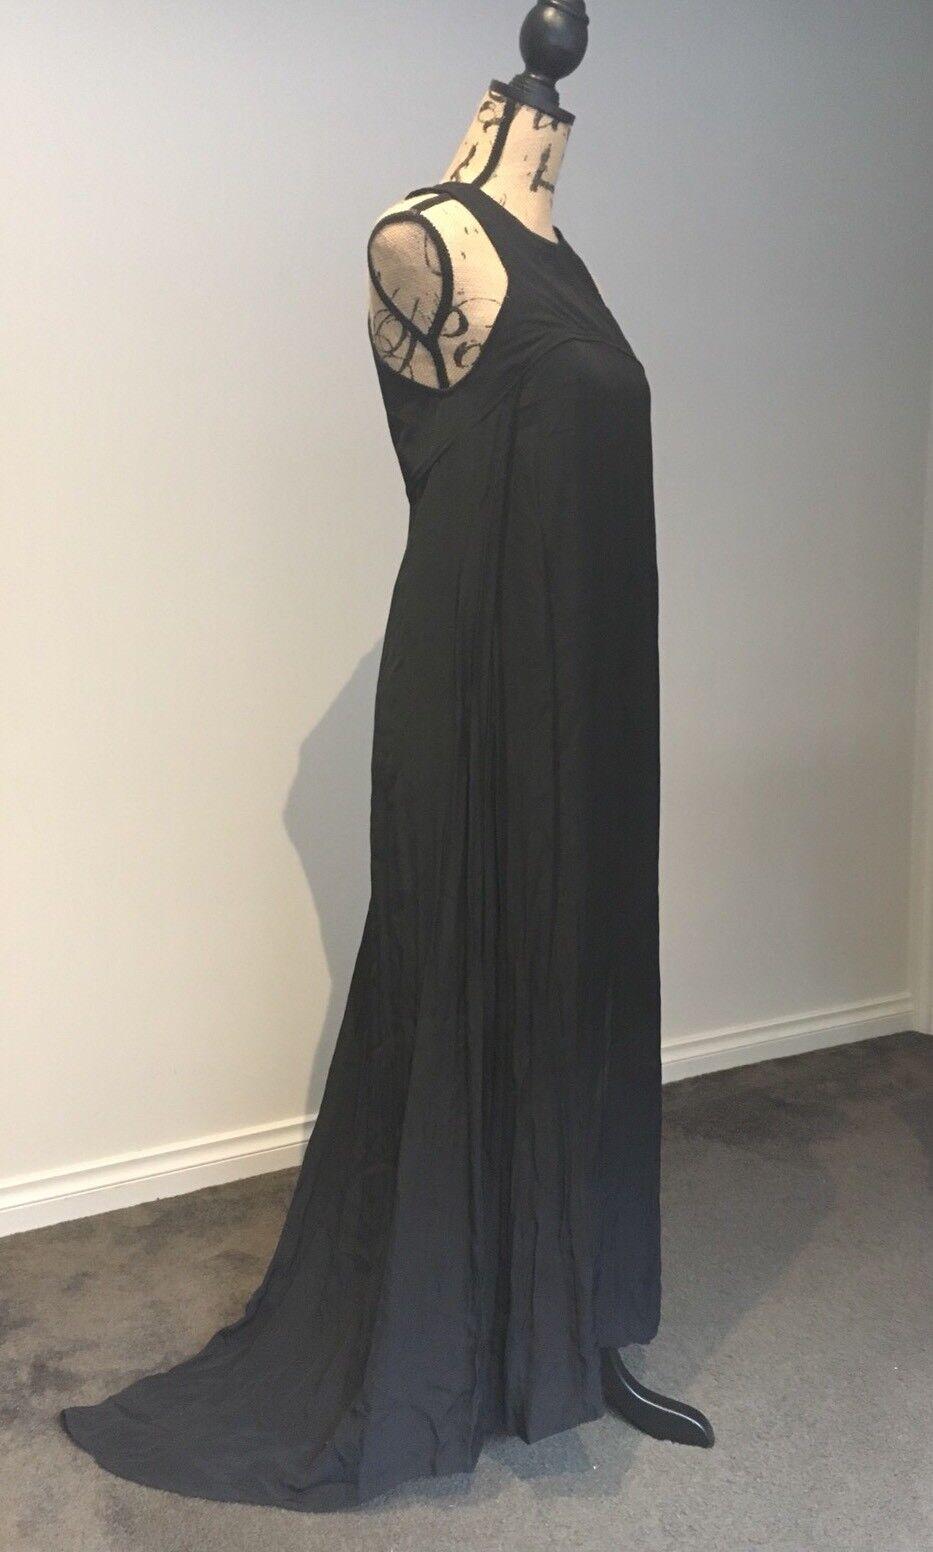 NWT Scanlan Theodore Asymmetrical Asymmetrical Asymmetrical Long Dress Size 10AU  6US RRP 500 cb336f